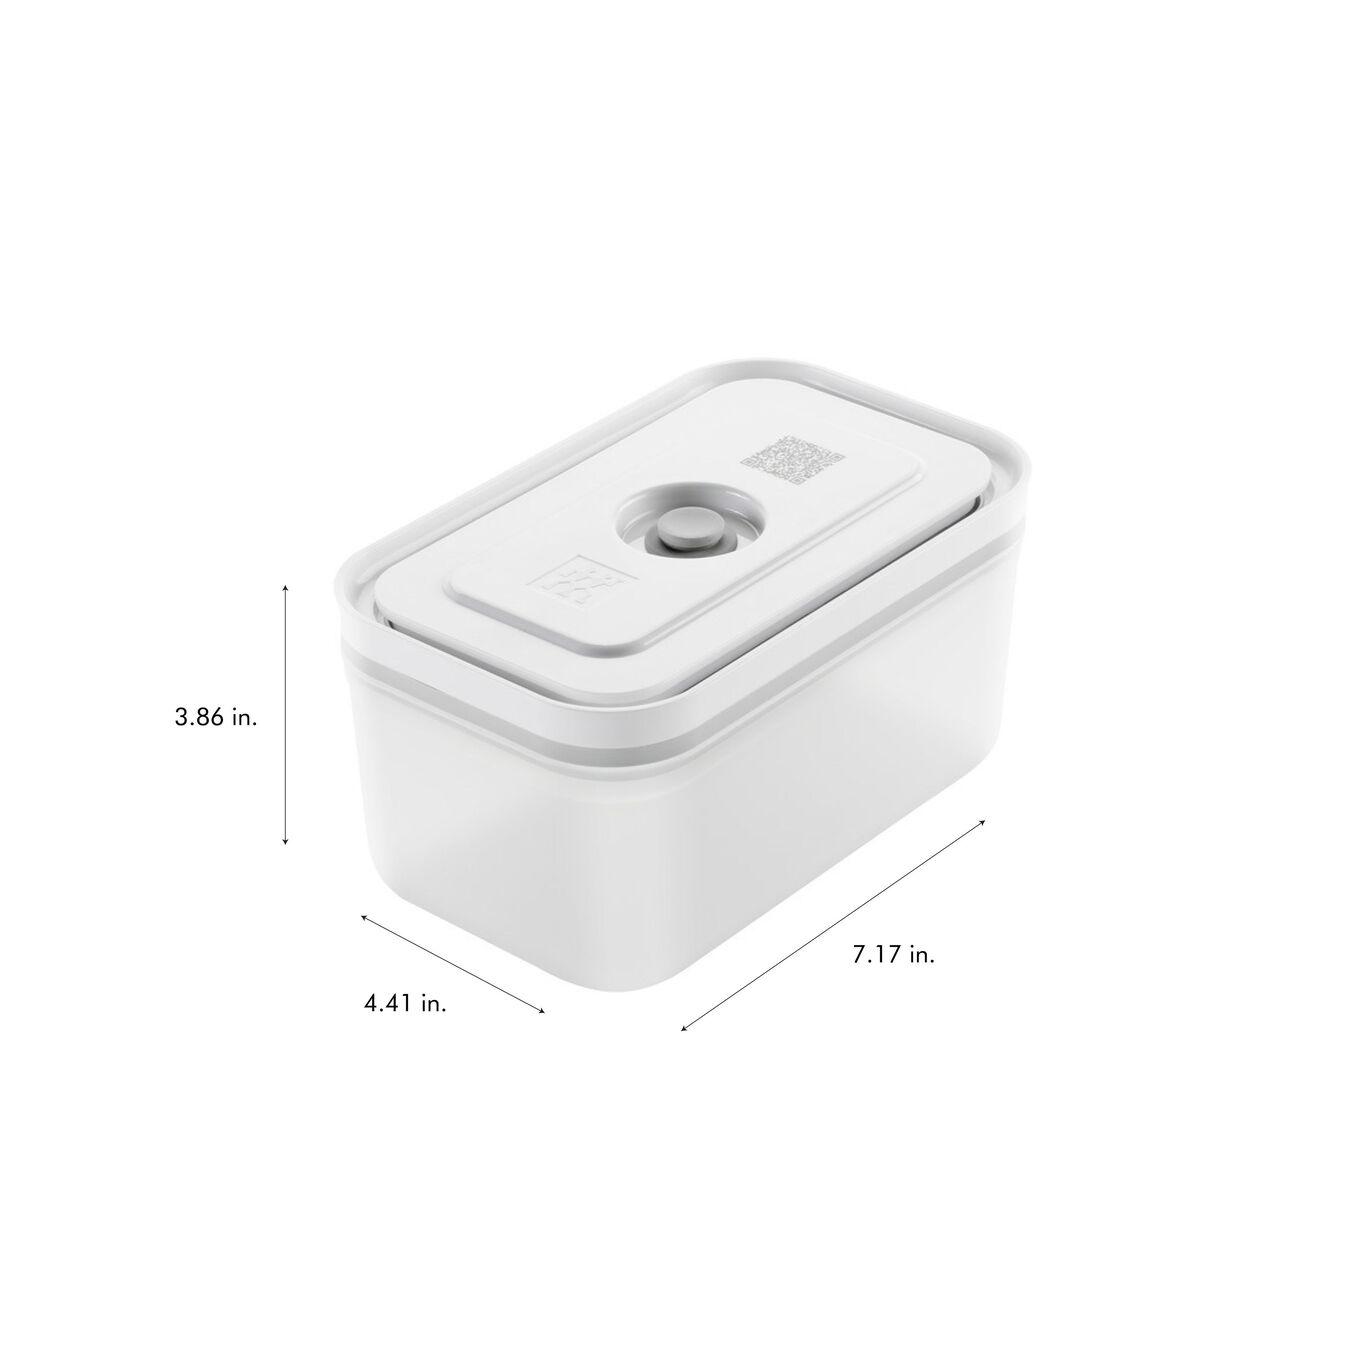 Vacuum starter set, 7-pc, Plastic, White,,large 14